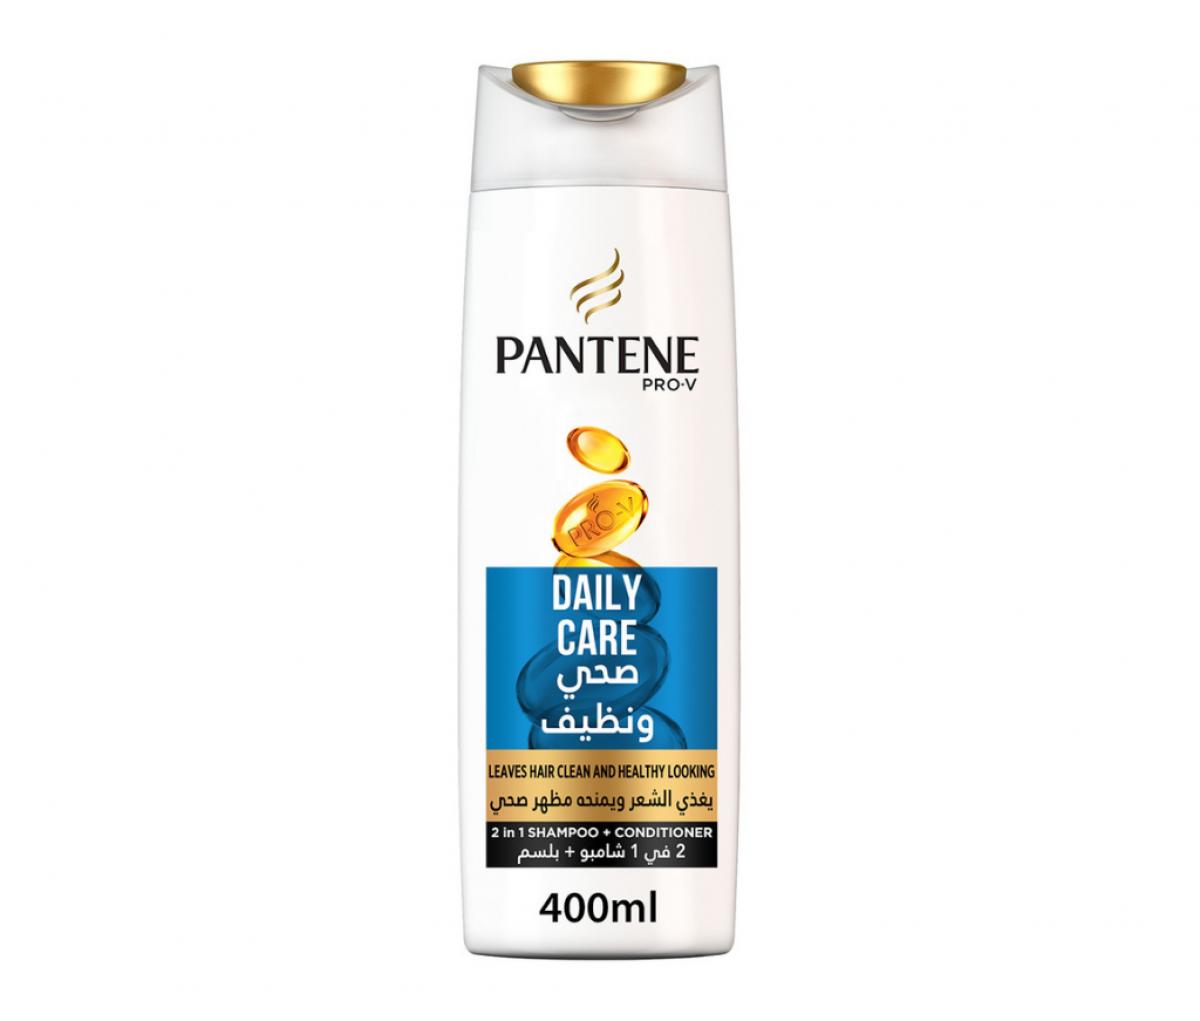 Pantene Shampoo 400ml Daily Care